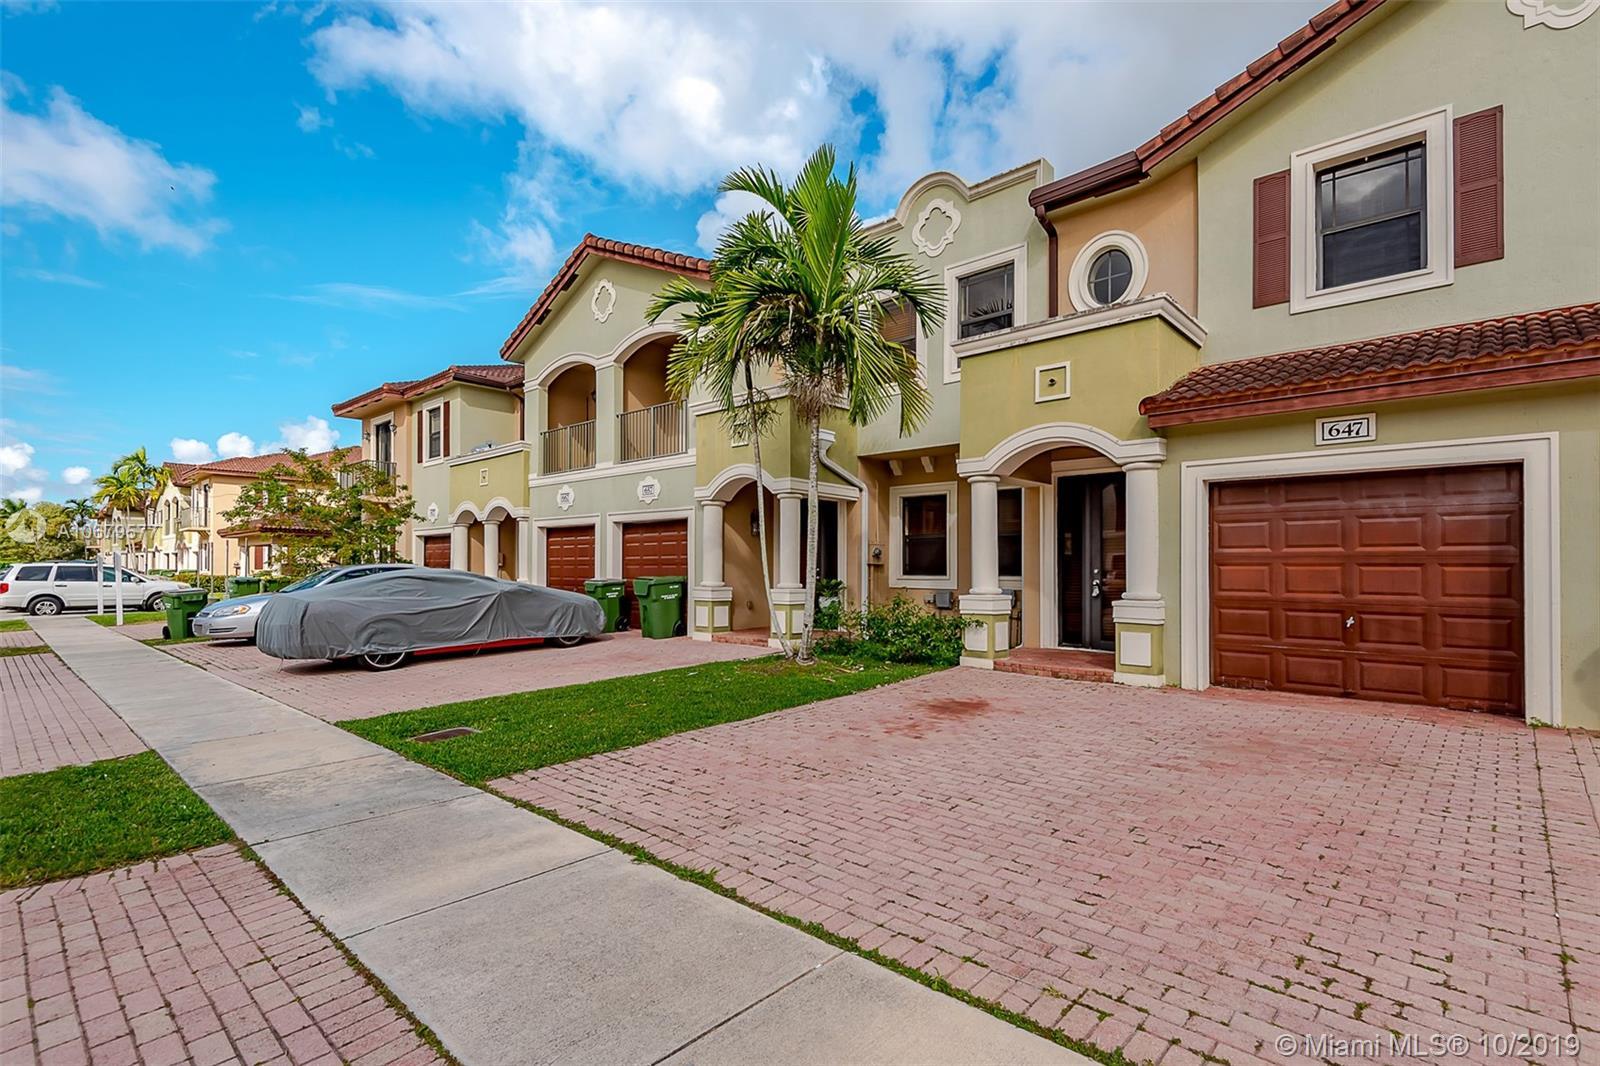 647 NE 35th Ave, Homestead, FL 33033 - Homestead, FL real estate listing